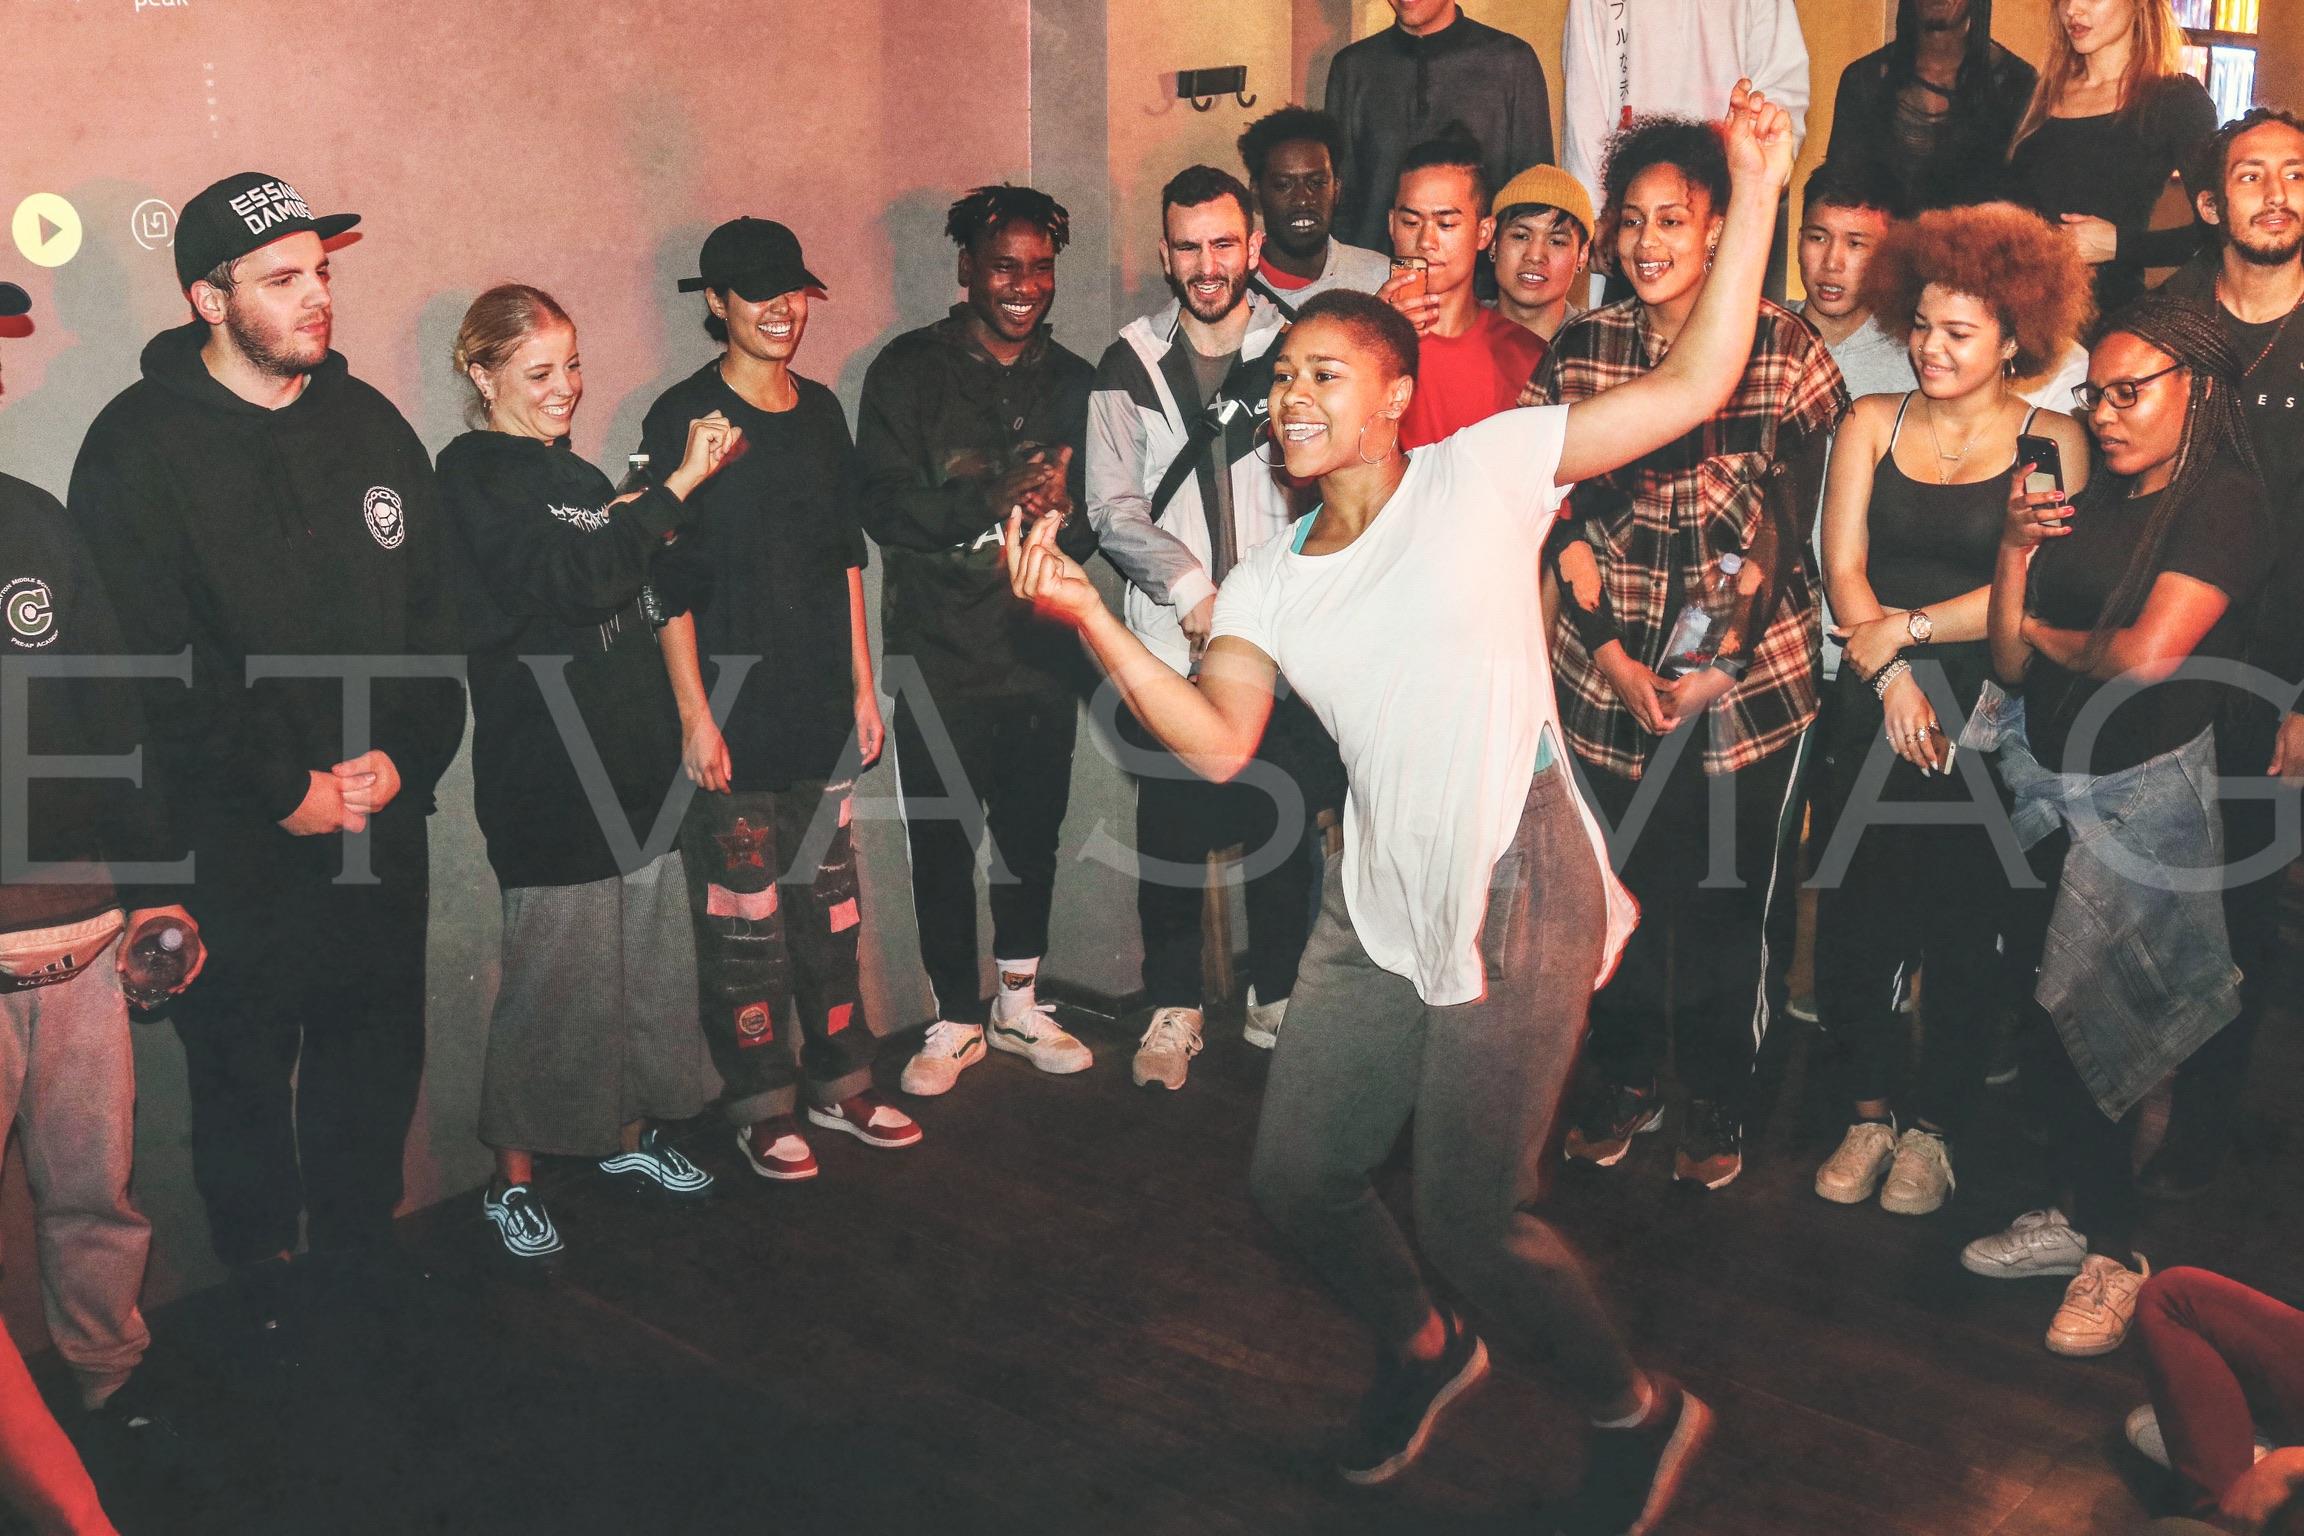 """OLDSCHOOL VS. NEWSCHOOL"" HIP HOP, 1:1 Freestyle Dance Battle"